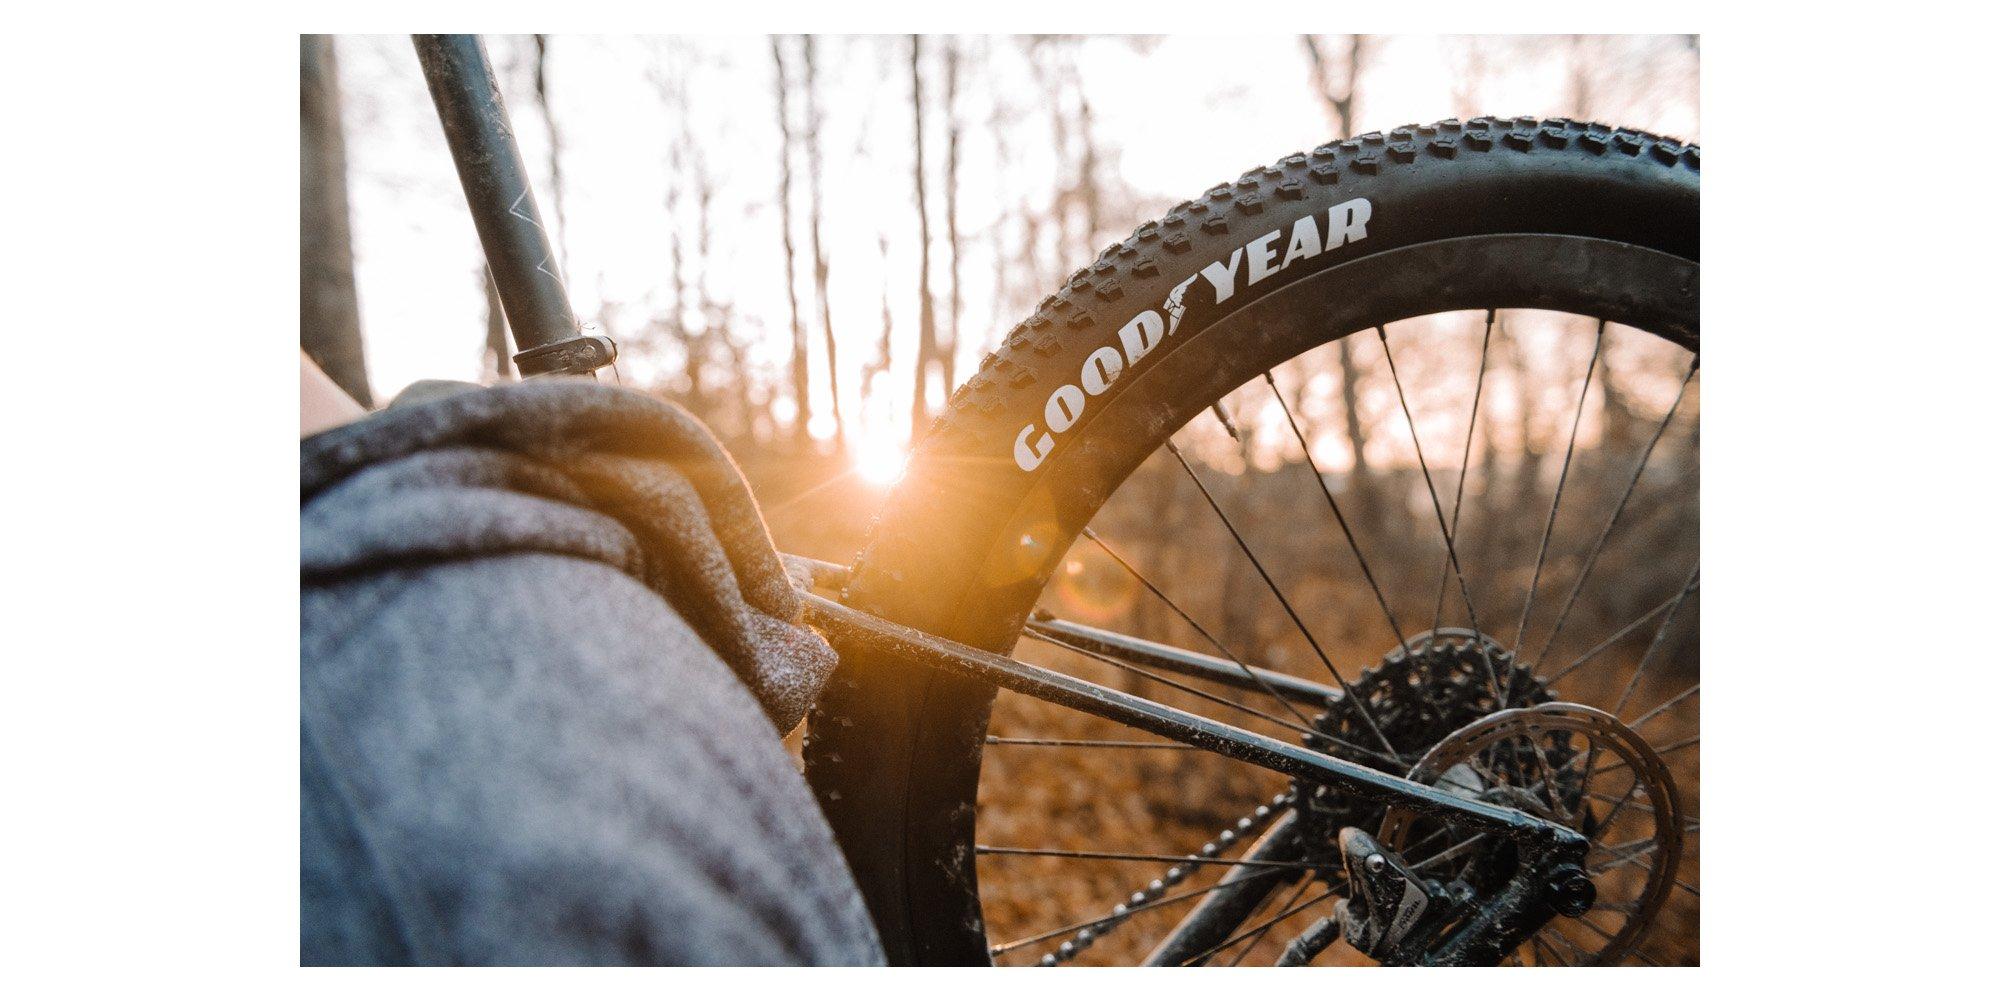 Photo of Goodyear Peak All-Terrain tire